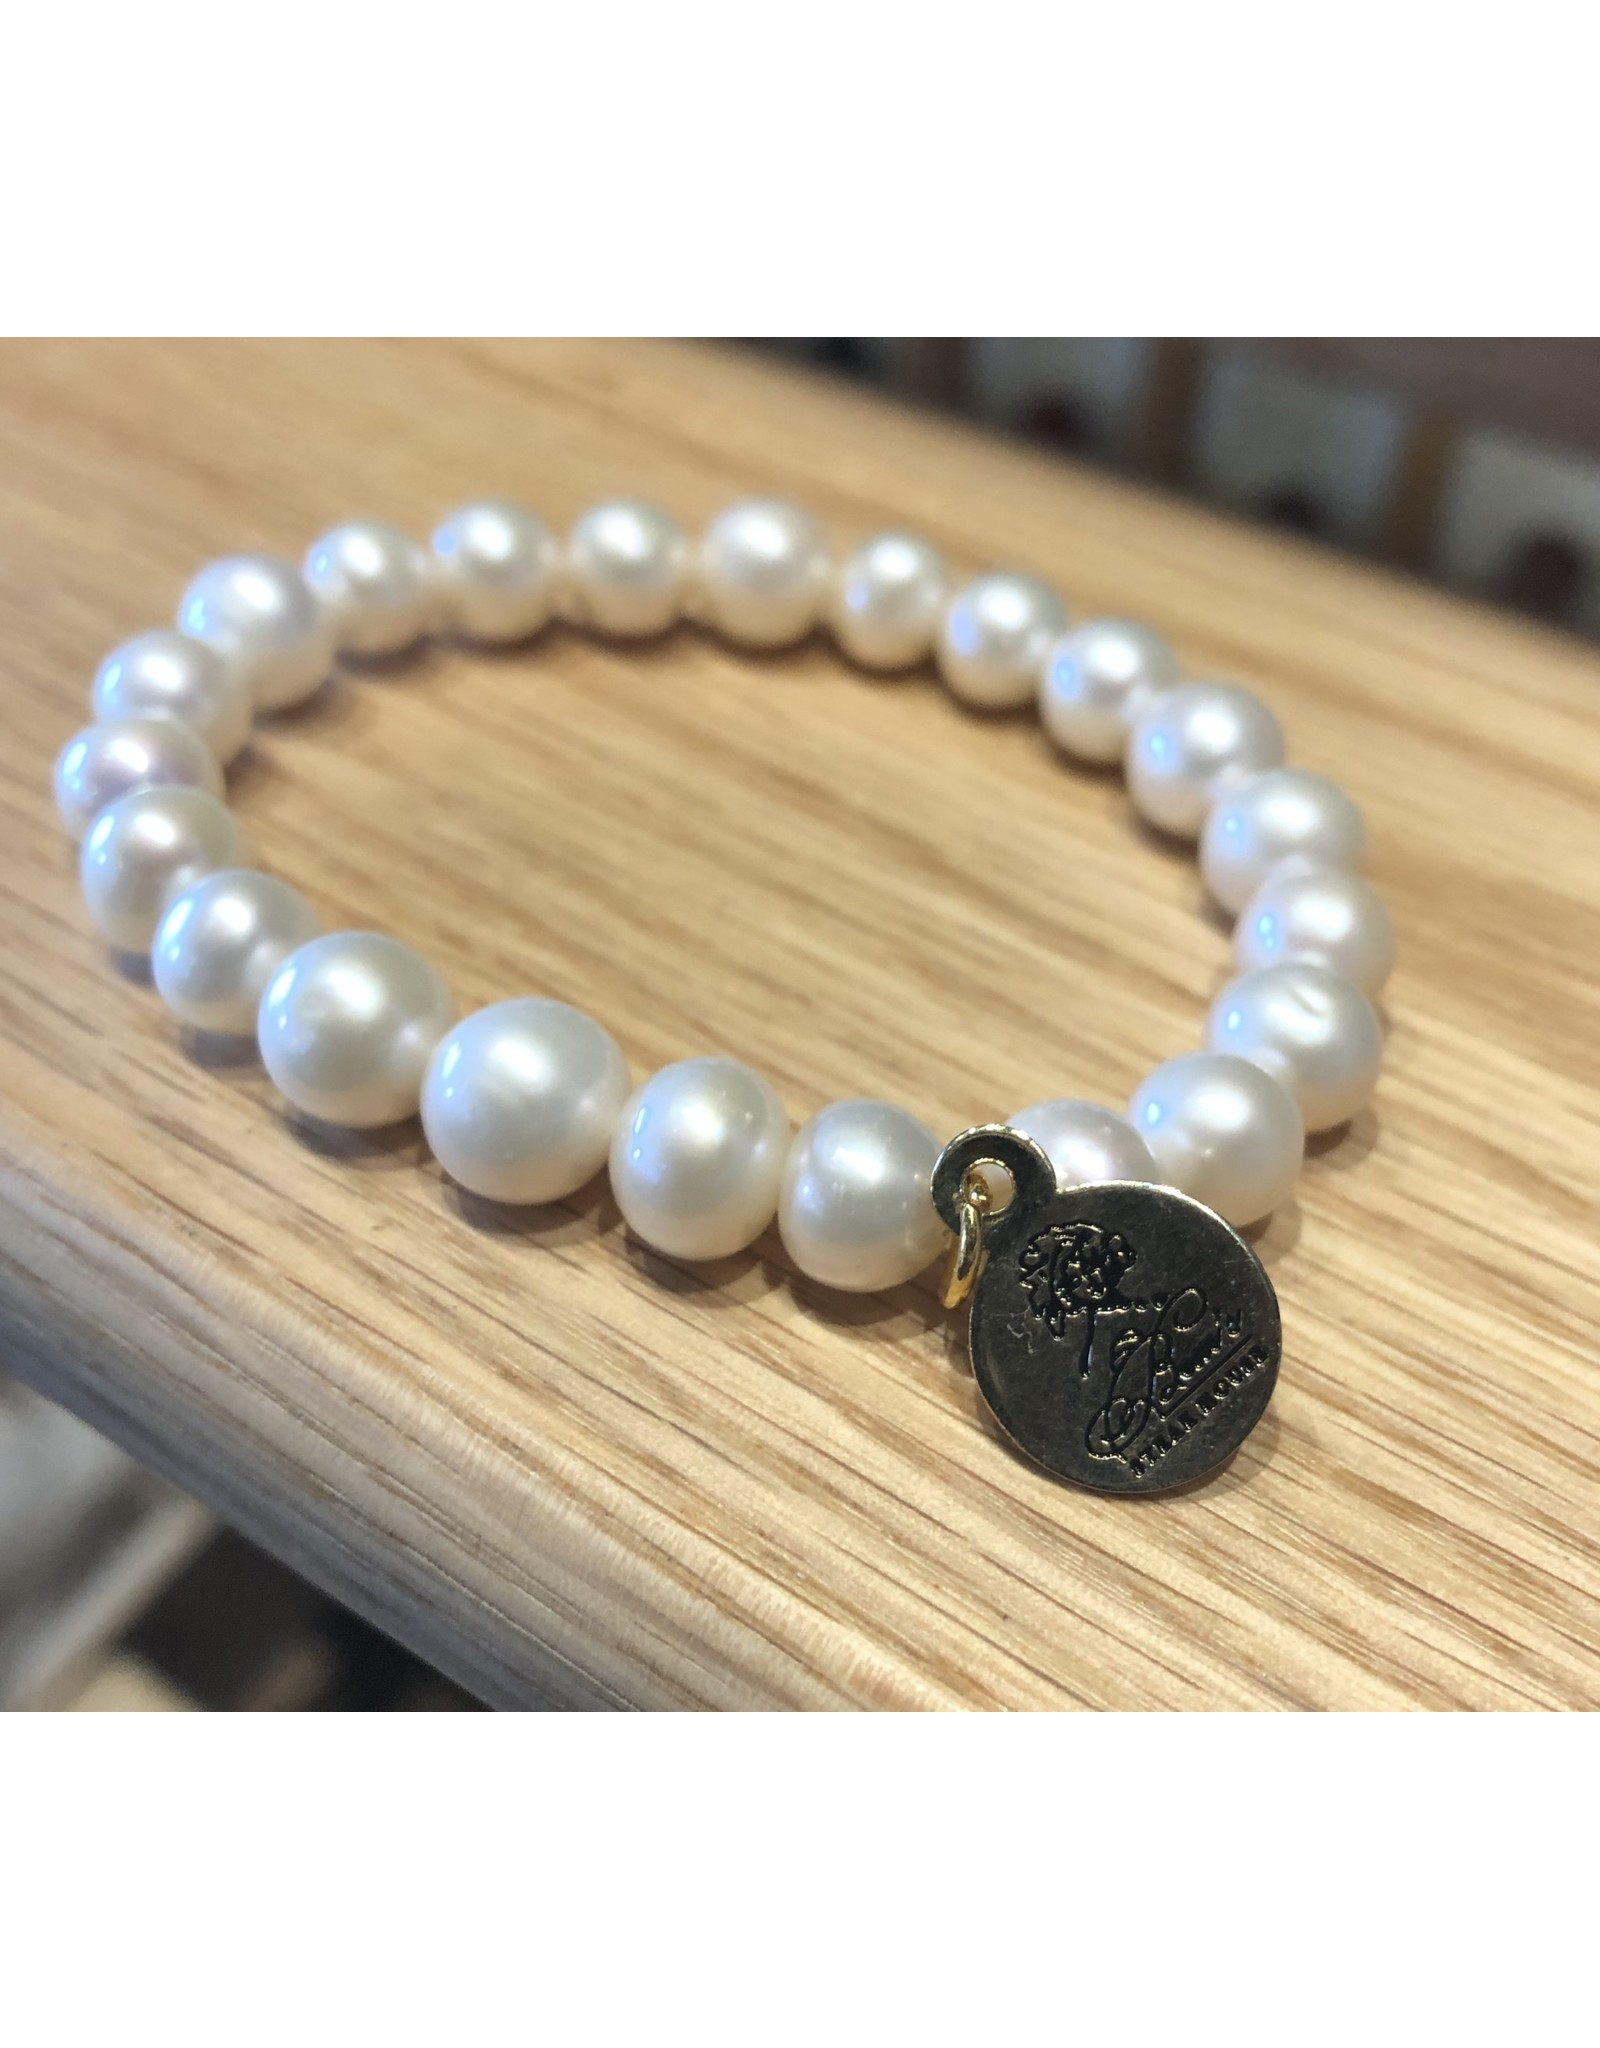 Bourbon and Bowties White Pearl Bracelet